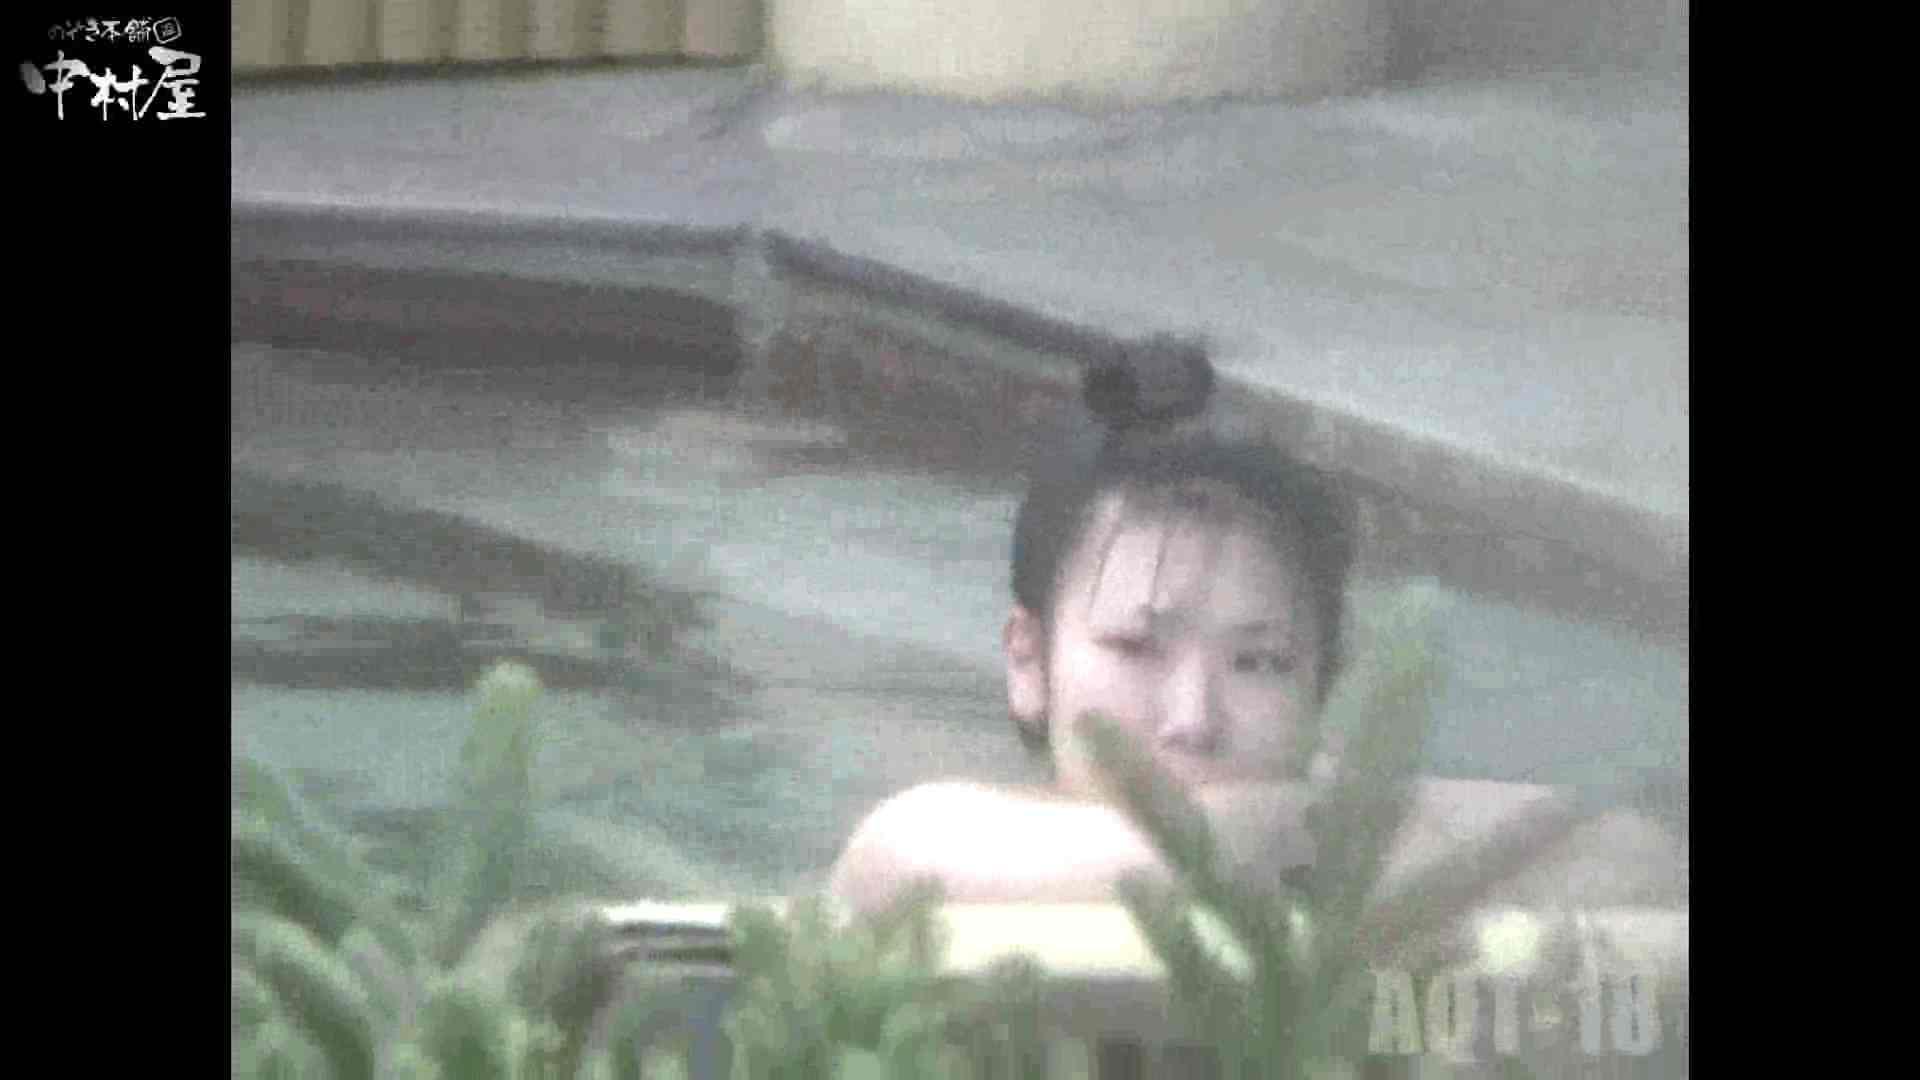 Aquaな露天風呂Vol.882潜入盗撮露天風呂十八判湯 其の二 盗撮 性交動画流出 90画像 66